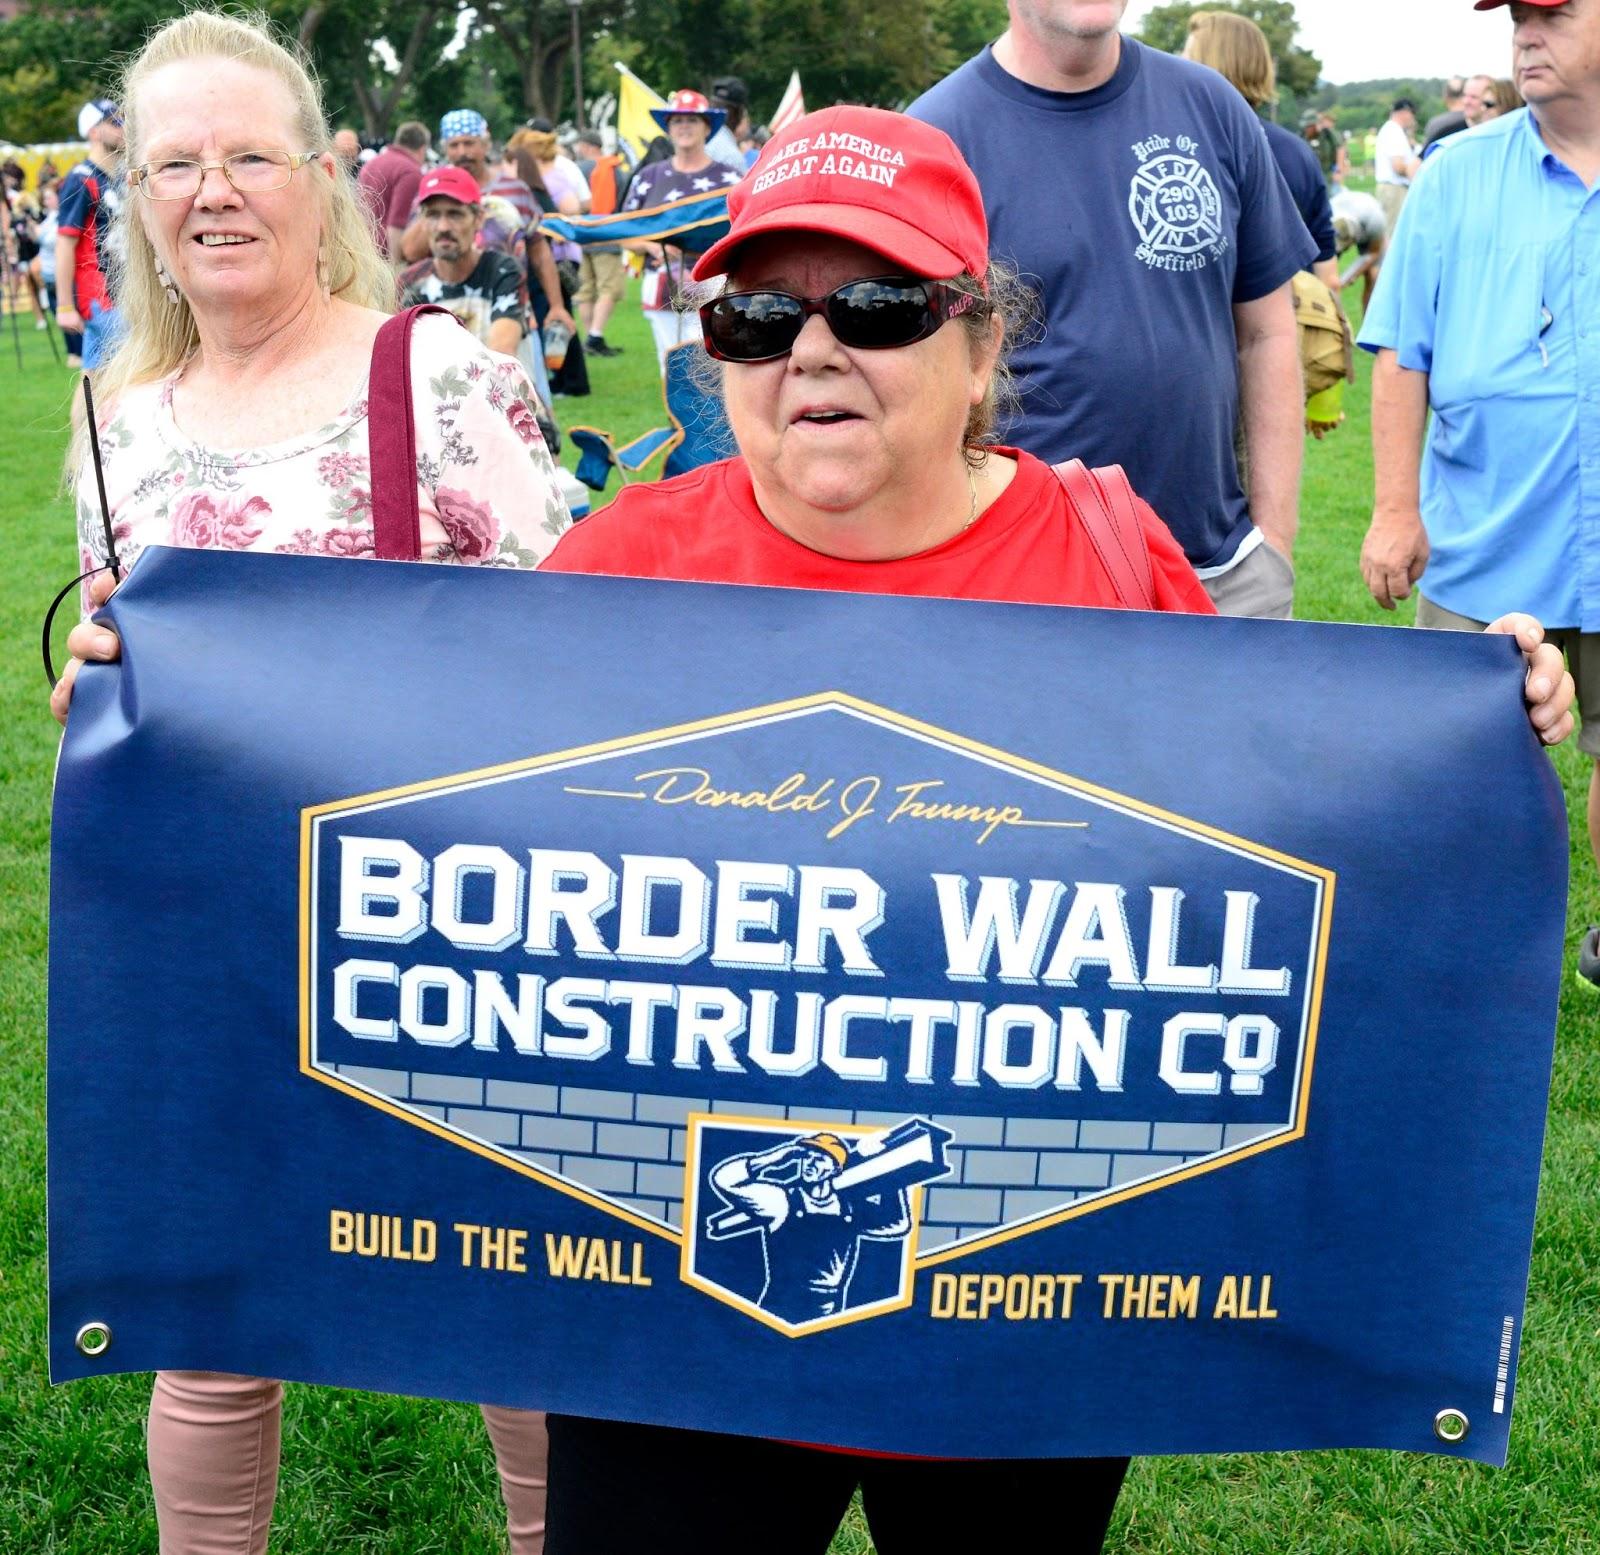 Border Wall Construction Co.